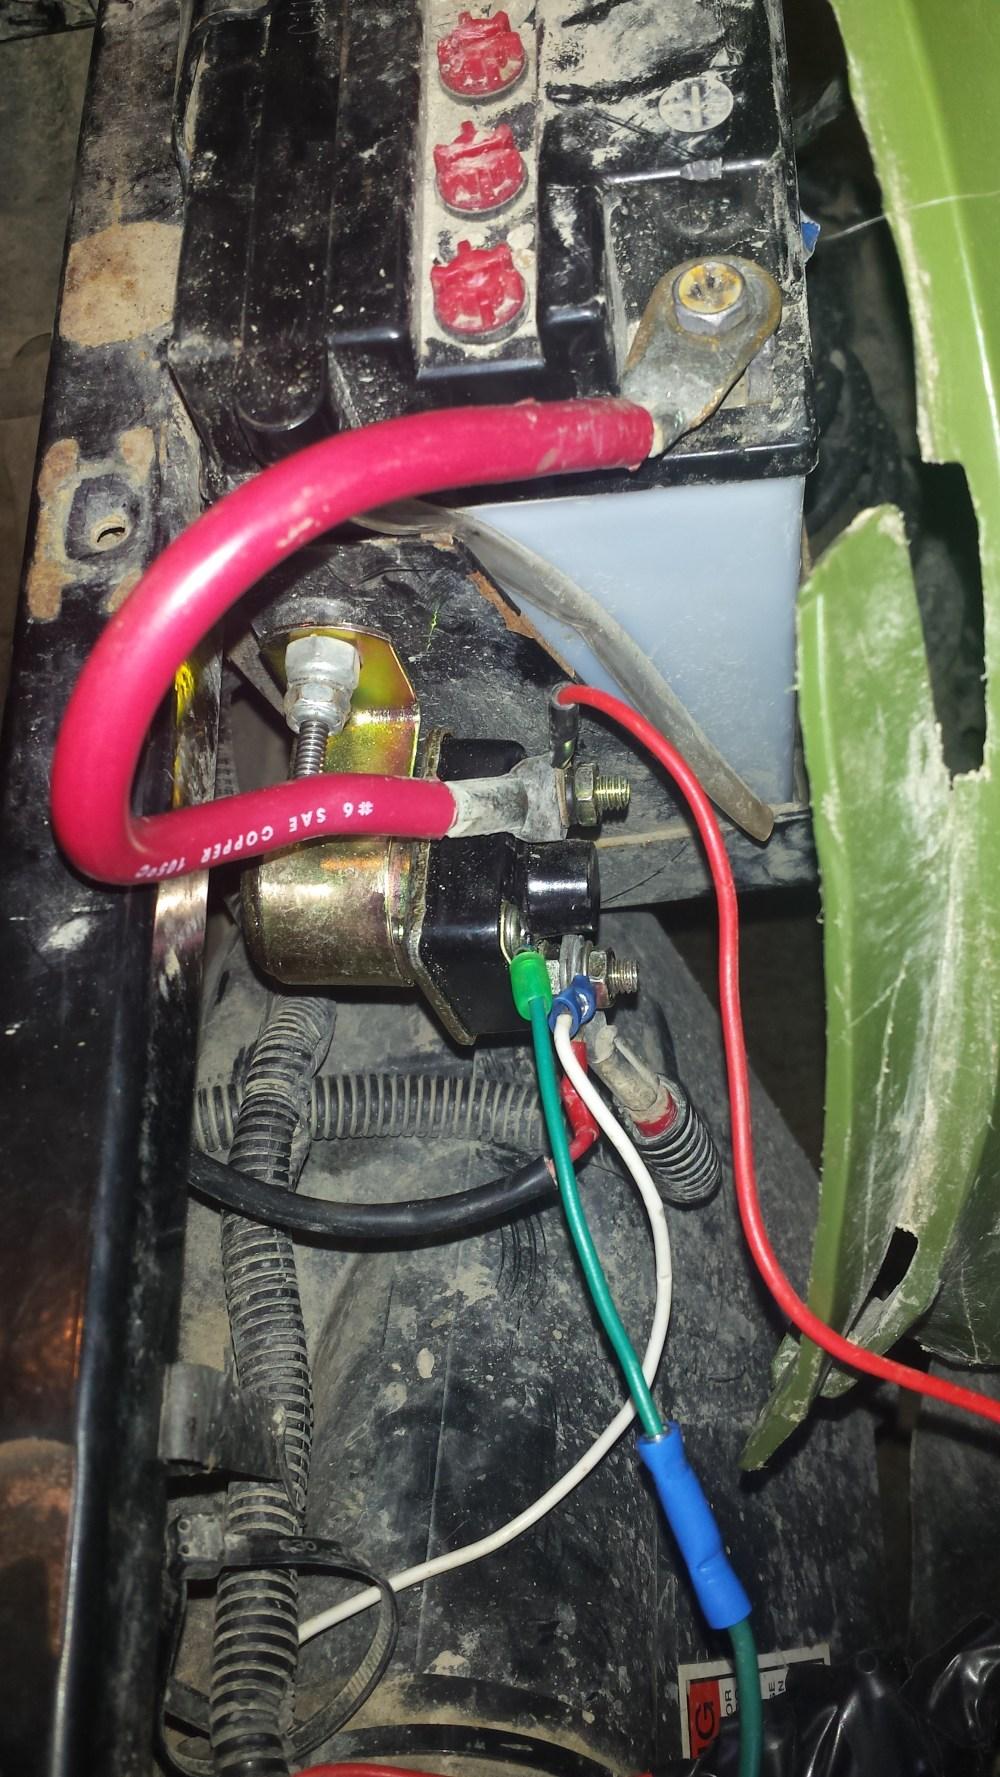 medium resolution of polaris starter solenoid wiring diagram 39 wiring polaris atv solenoid wiring diagram polaris ranger solenoid wiring